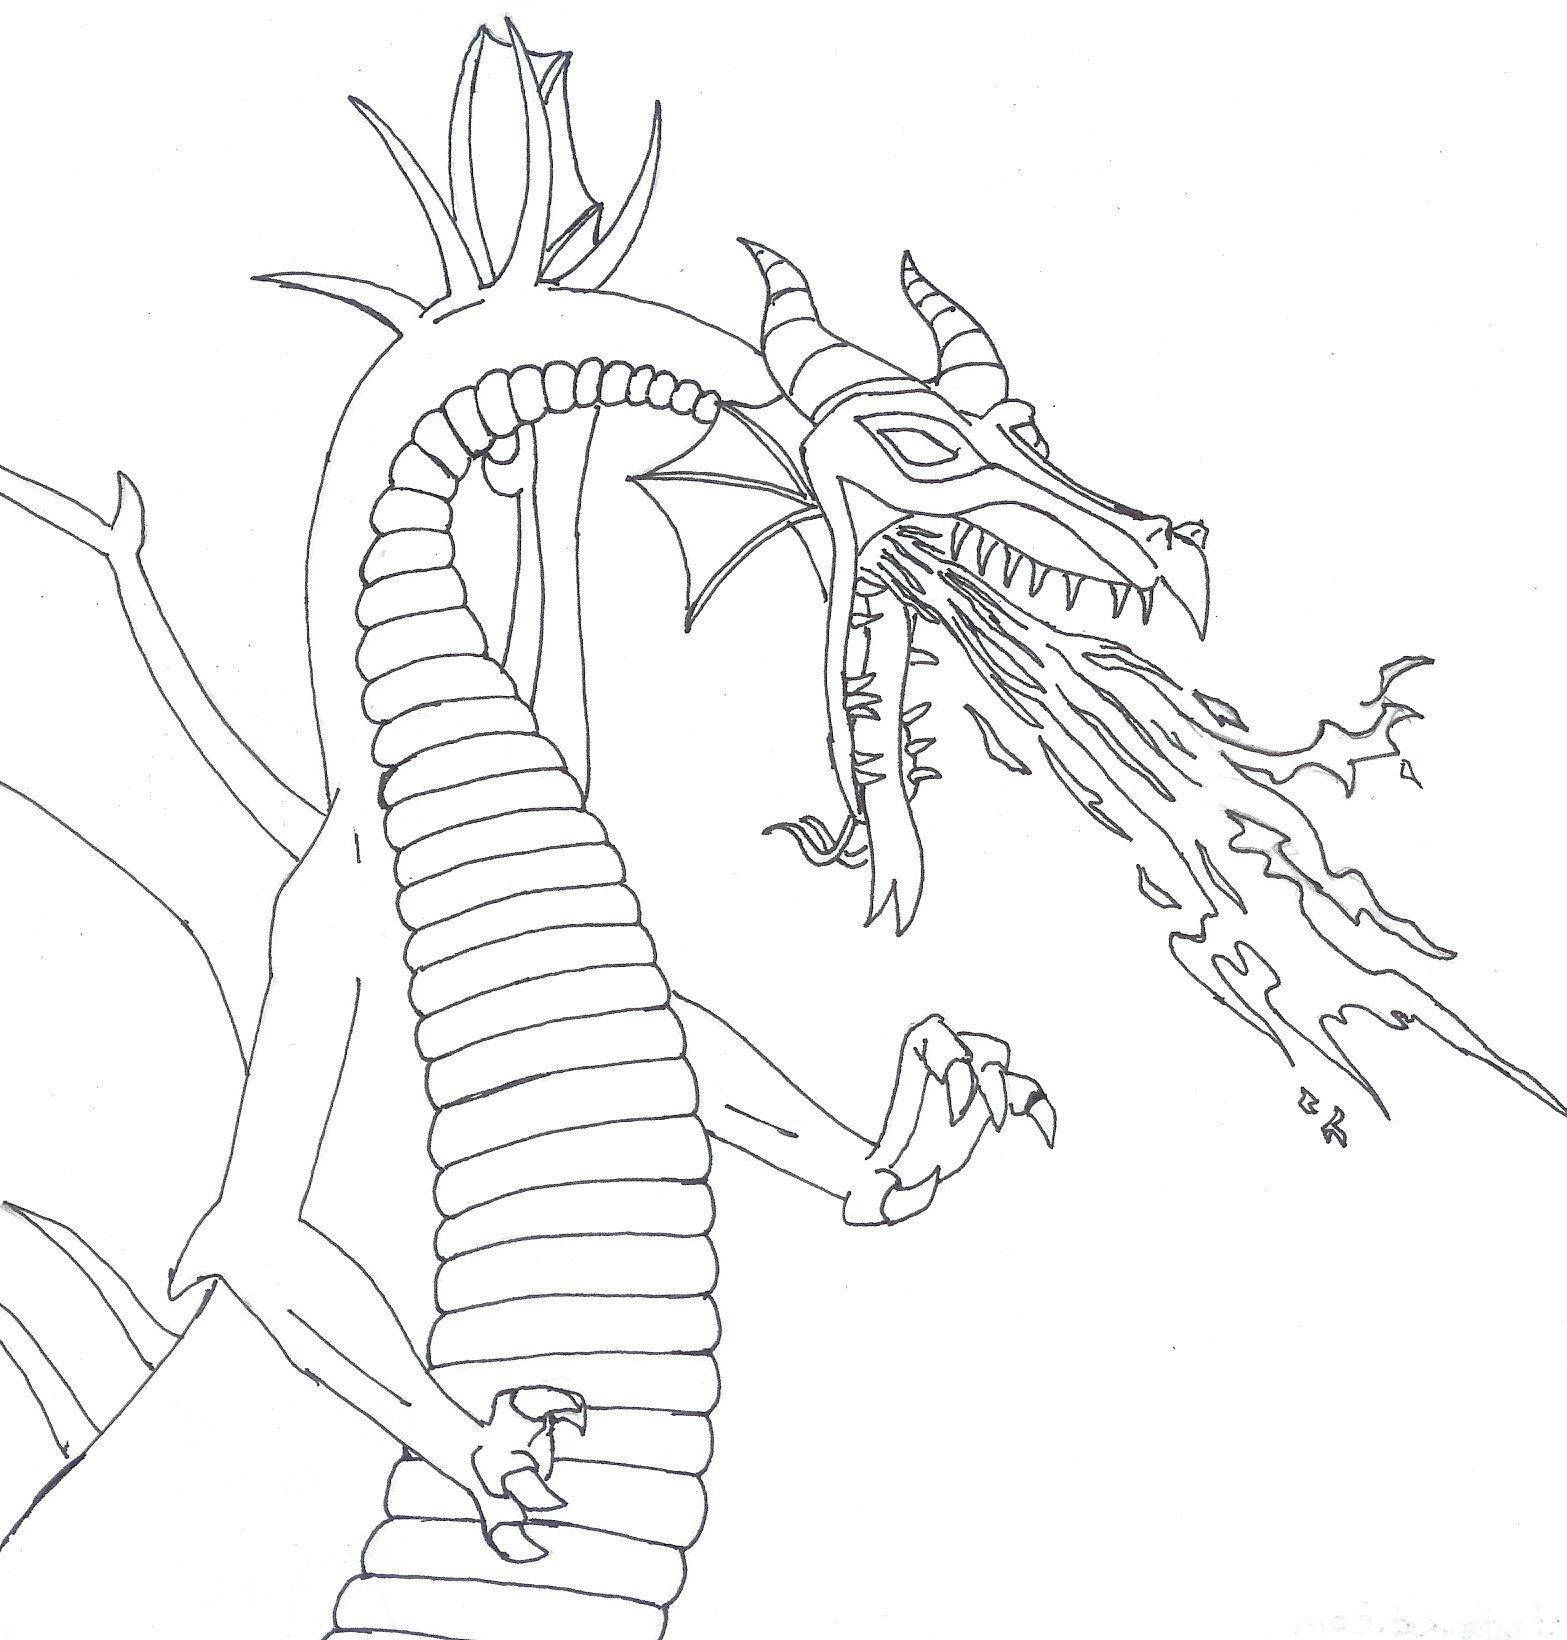 maleficent_dragon_by_nightangelworks.jpg (1567×1640)